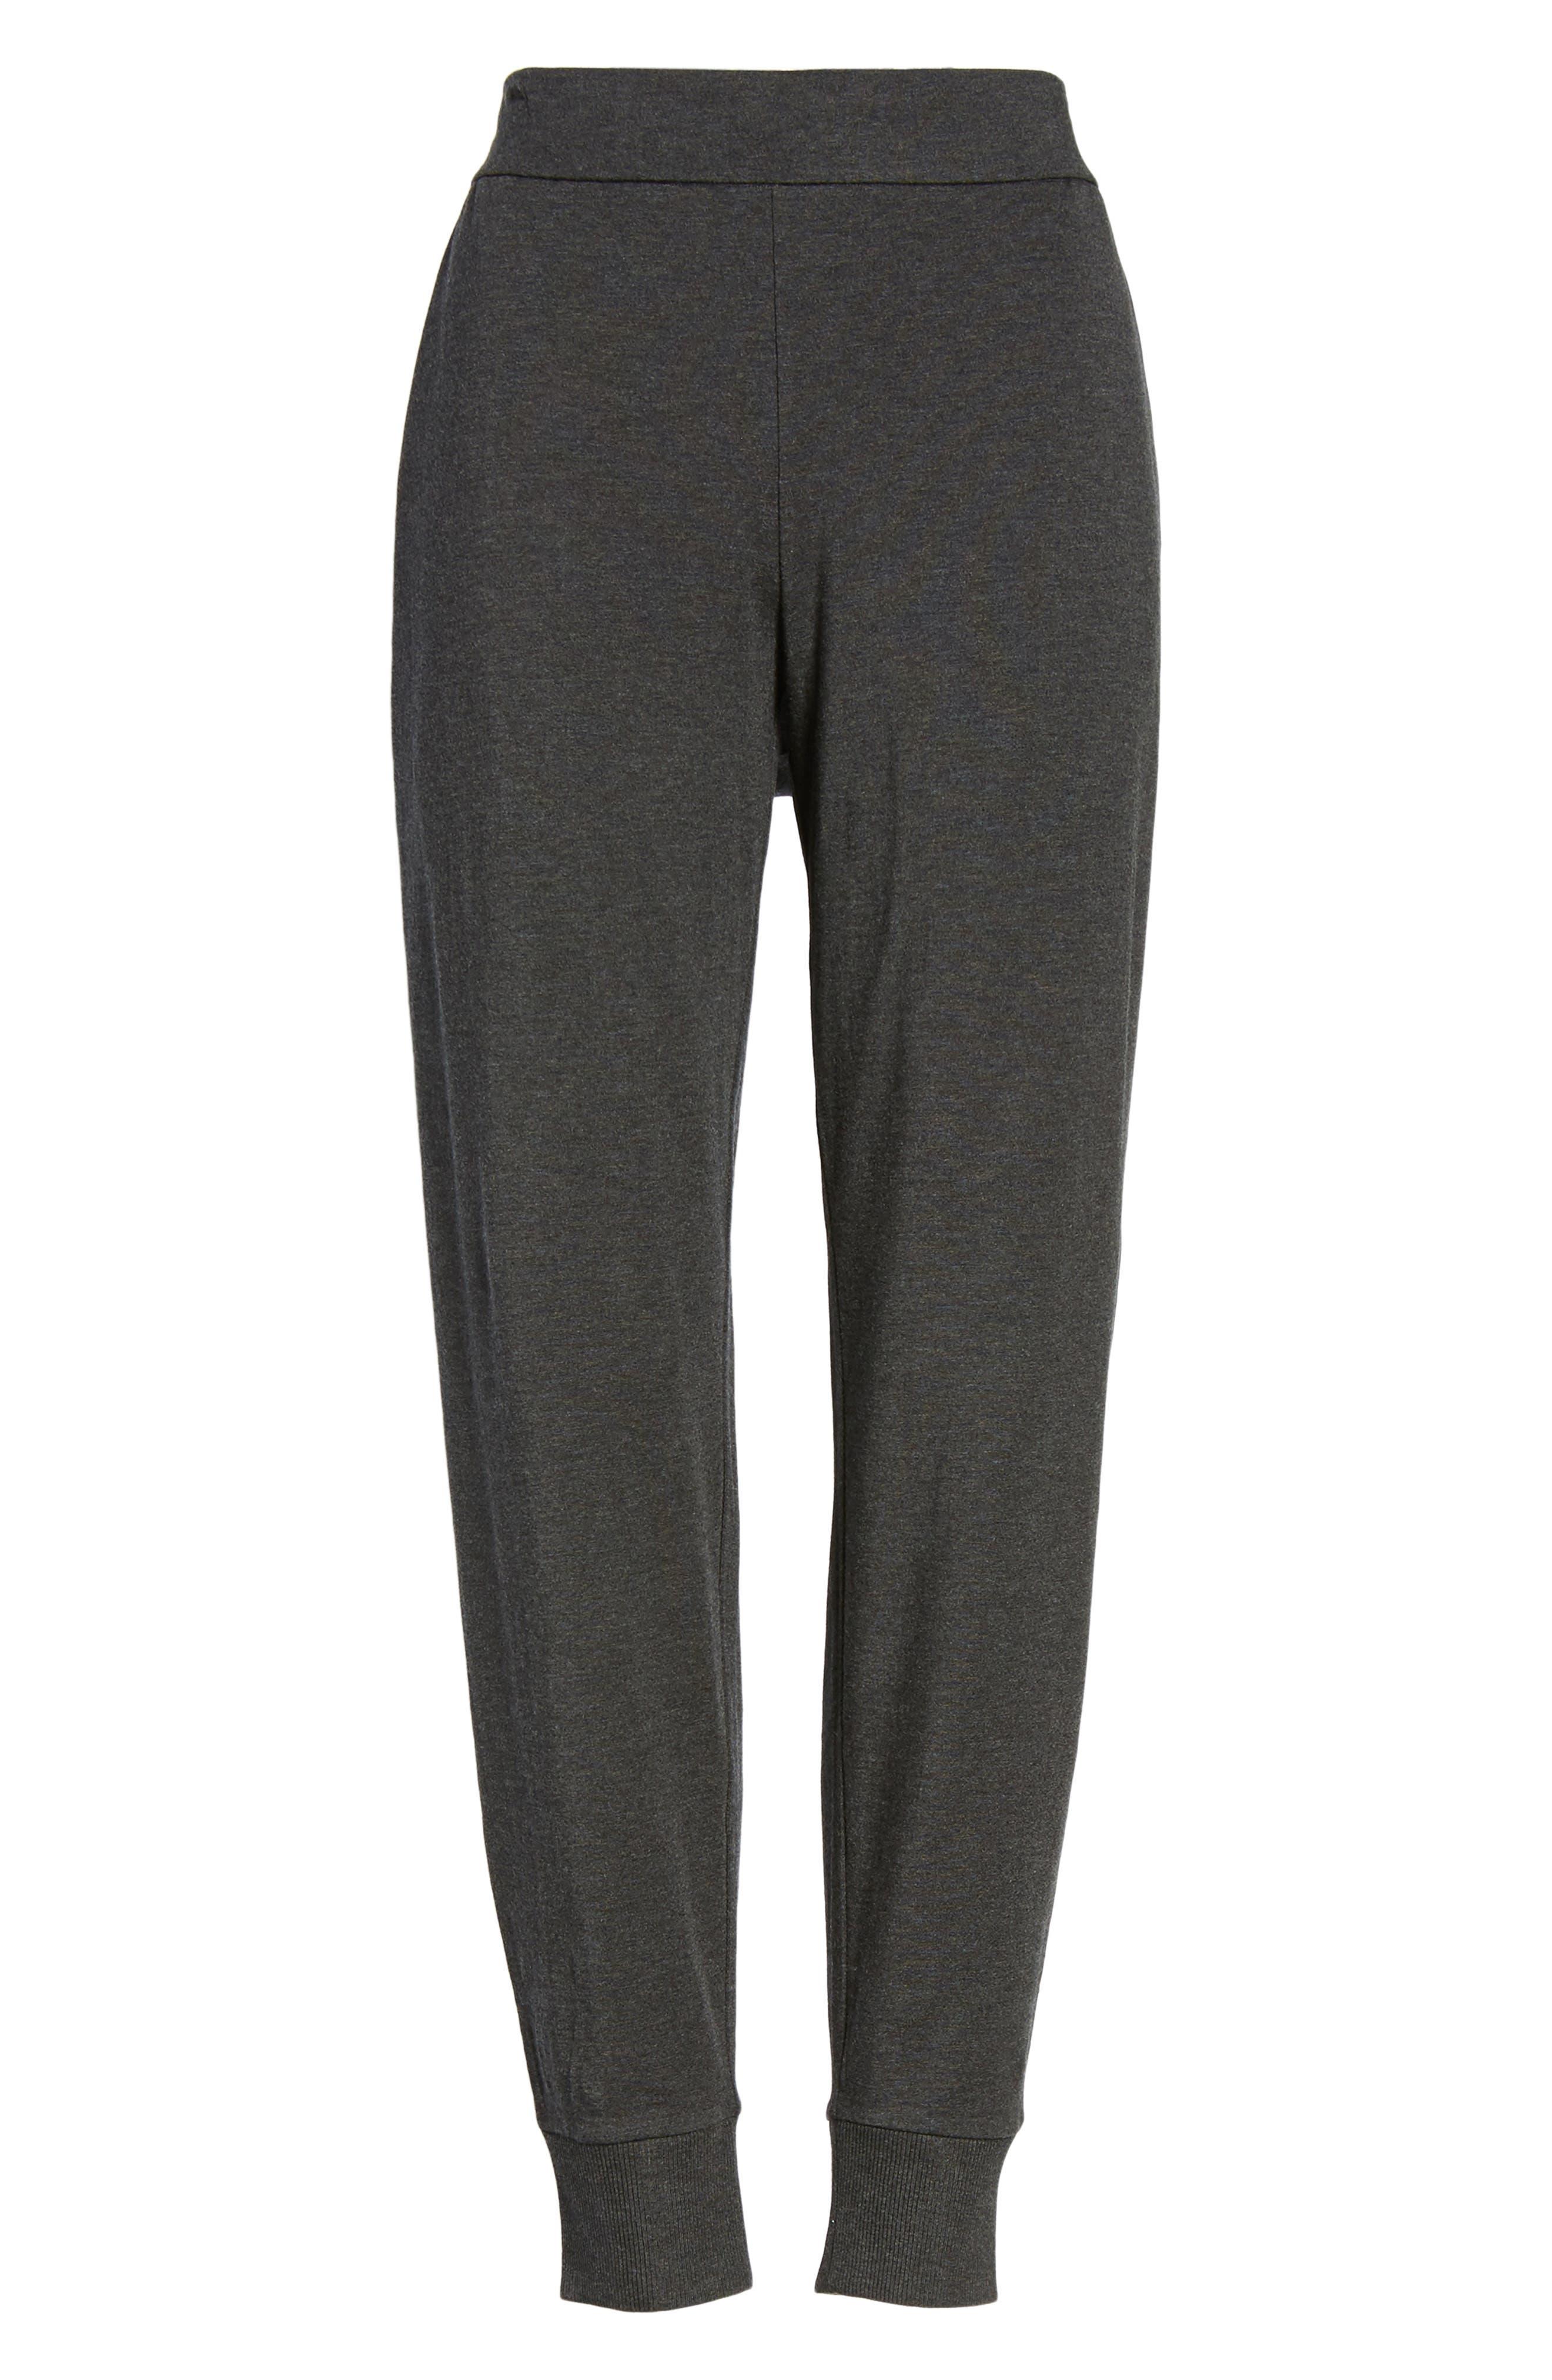 Slouchy Knit Pants,                             Alternate thumbnail 6, color,                             021